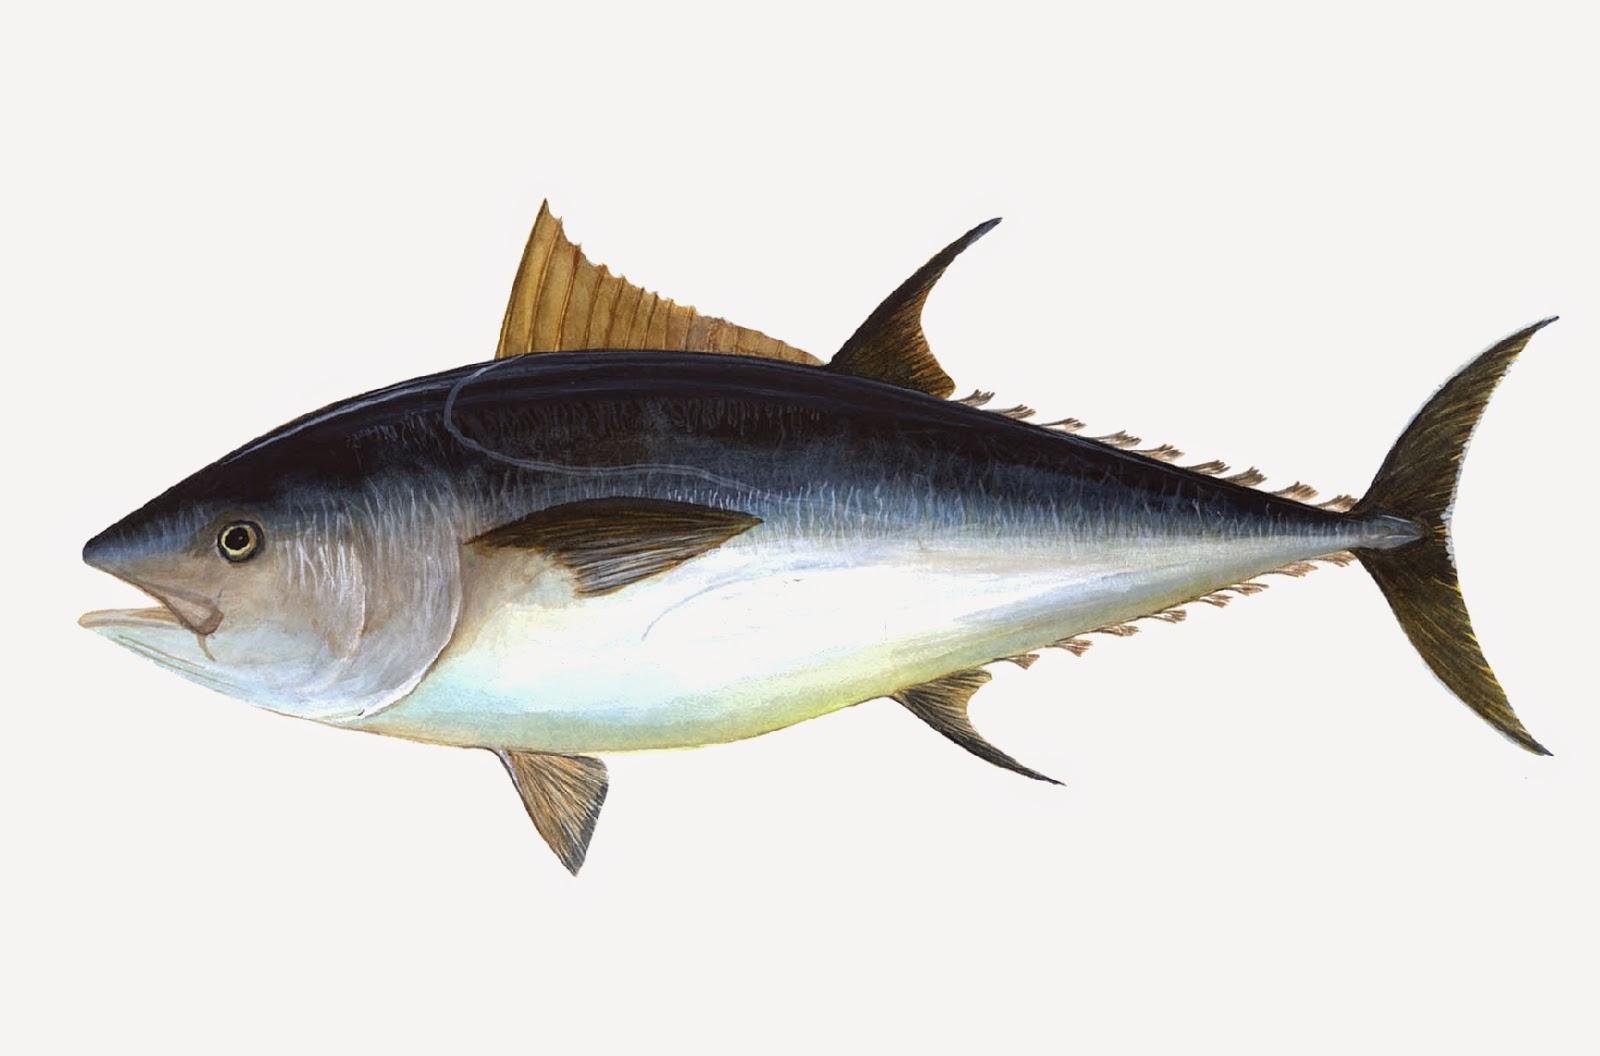 pescado omega 3 dieta vegetariana